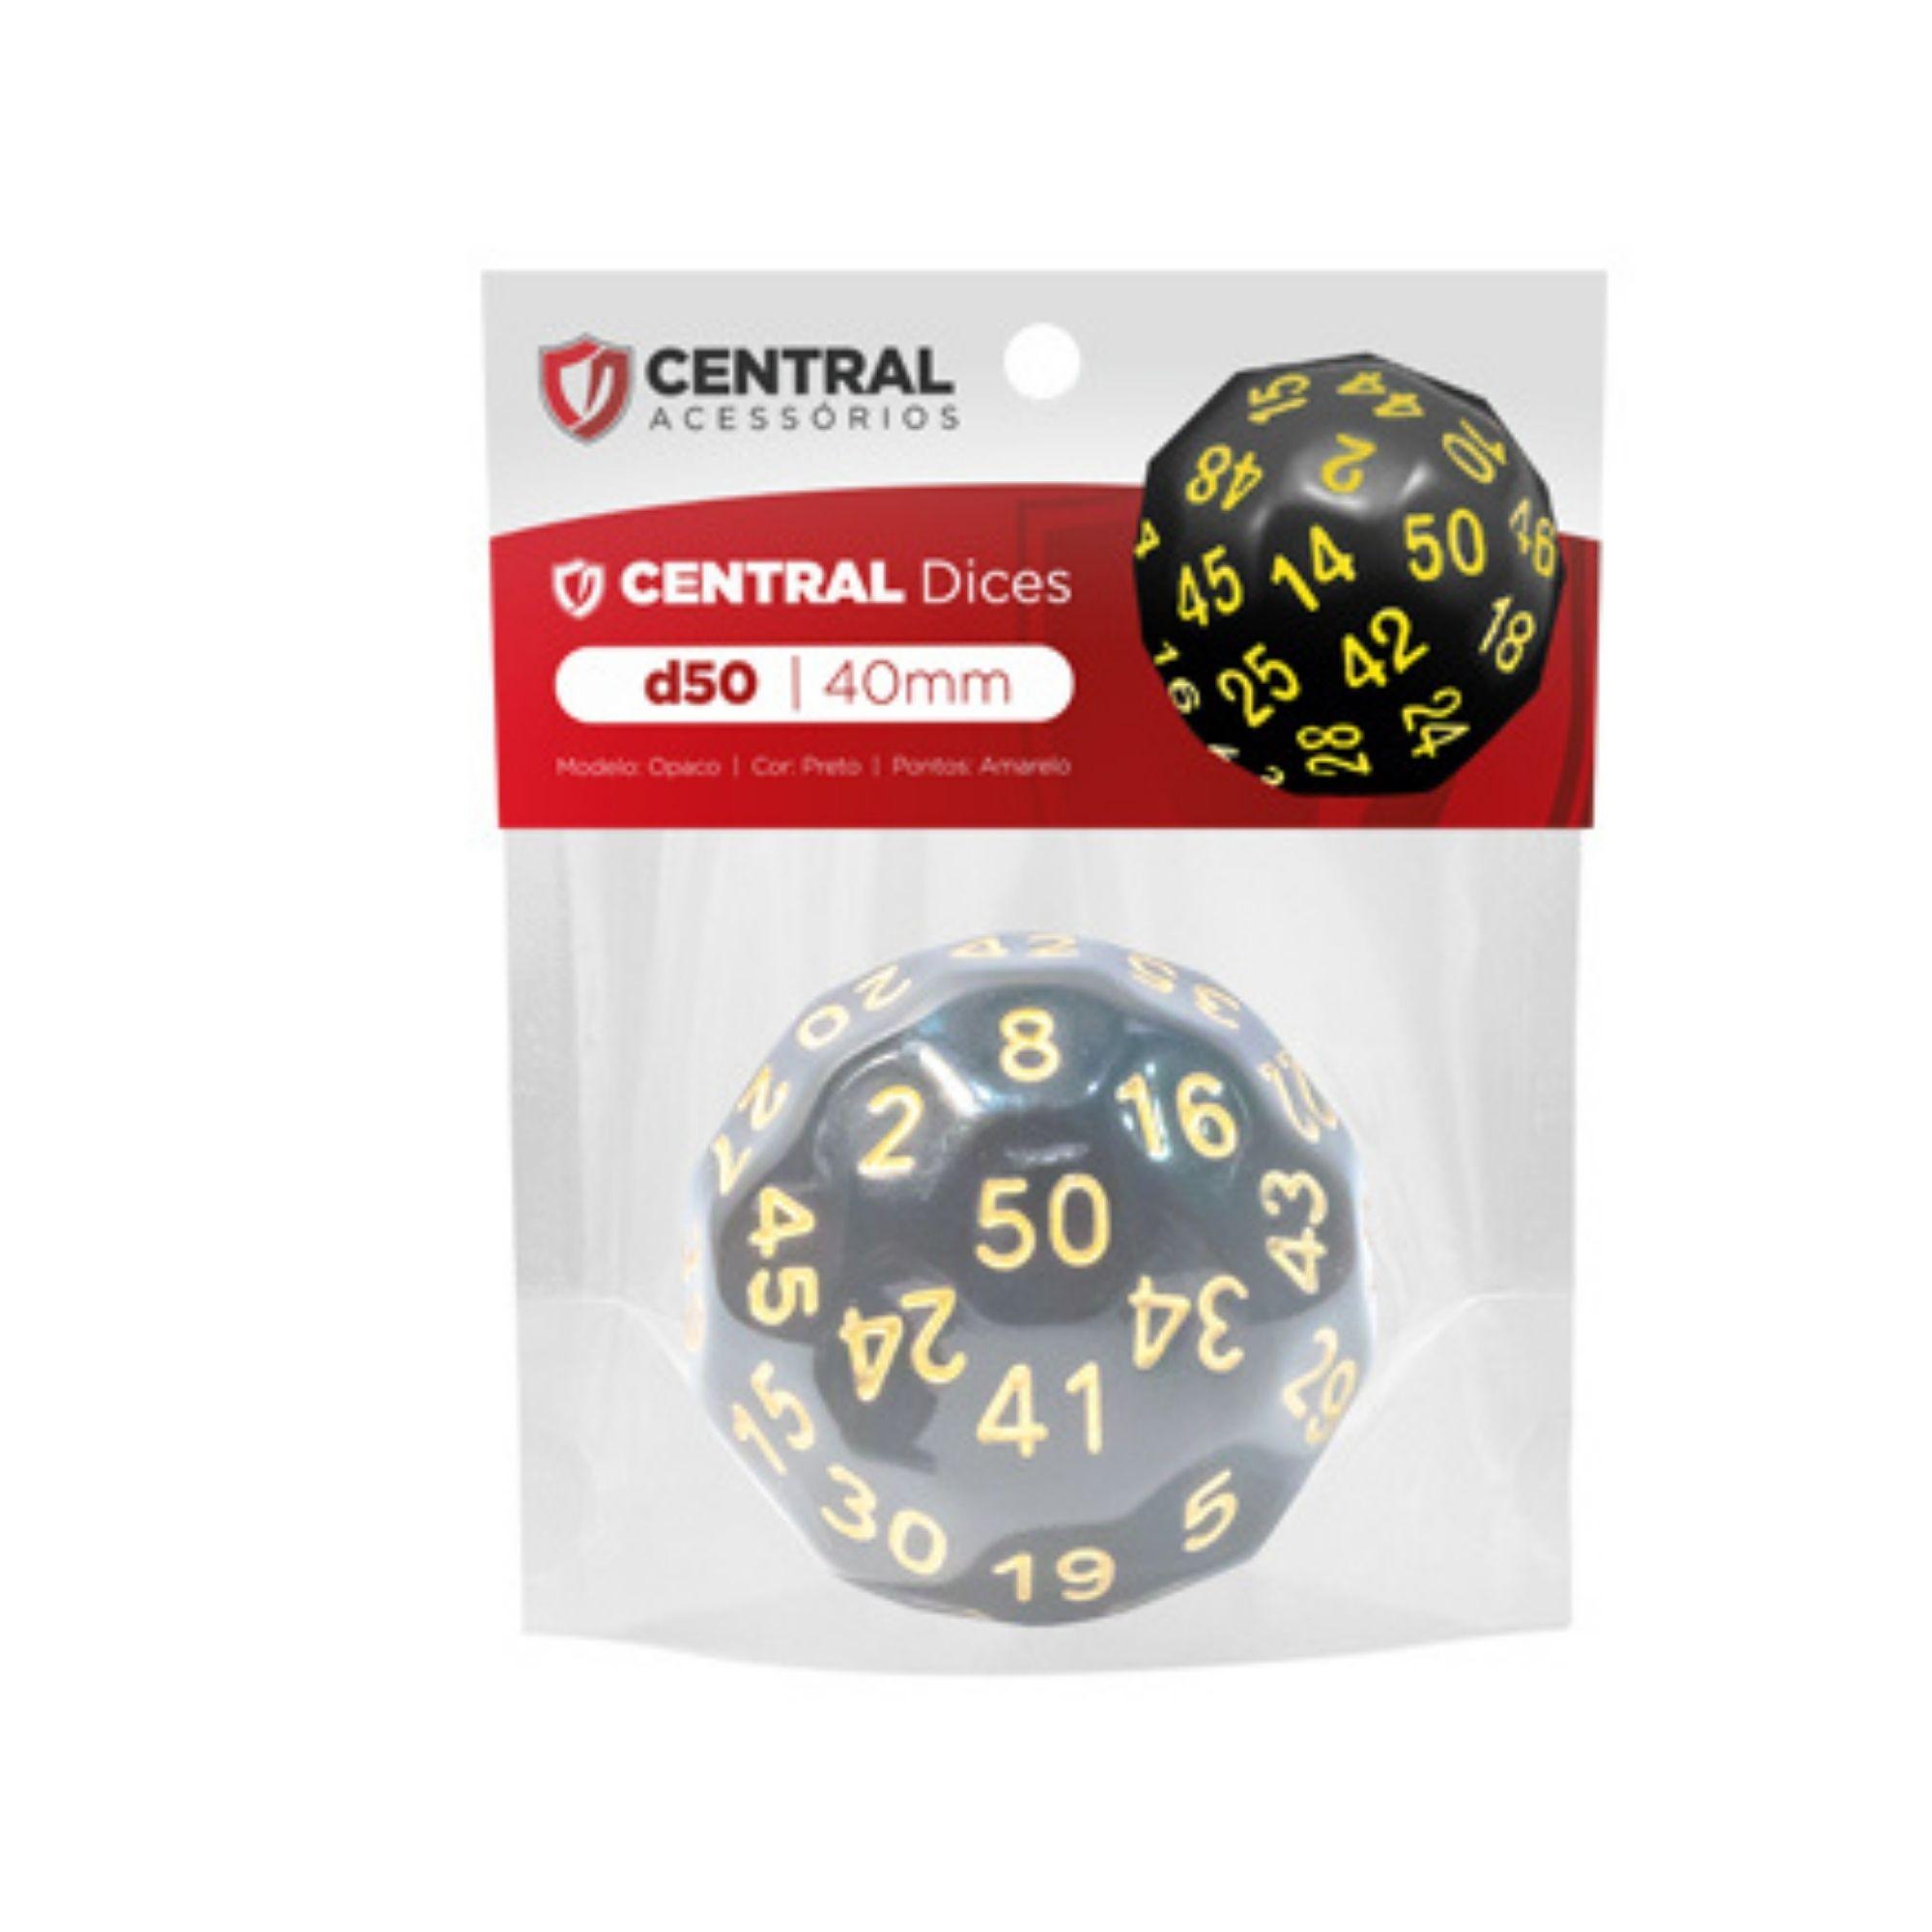 Central Dices D50 de 40mm Preto e Amarelo